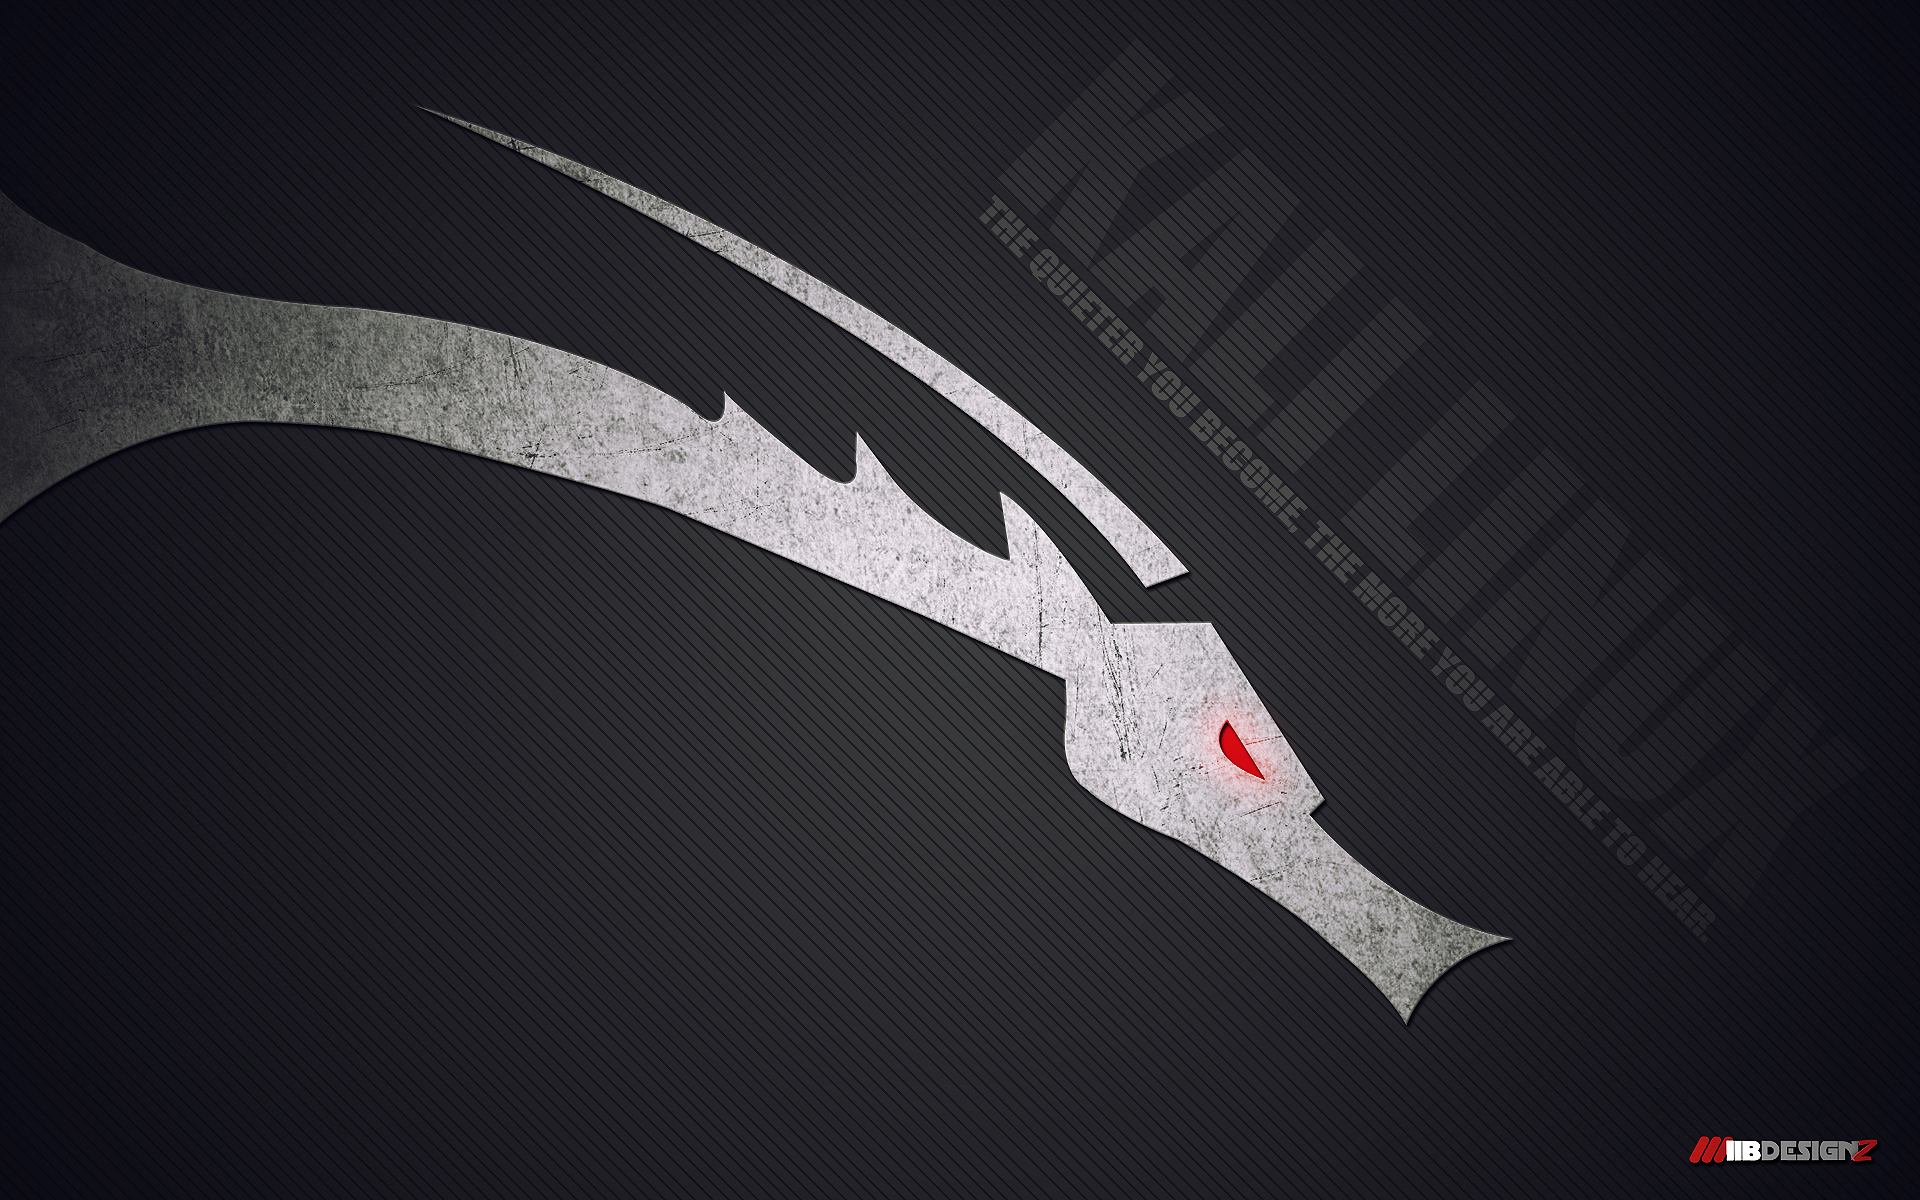 Kali Linux wallpapers Kali Linux stock photos 1920x1200